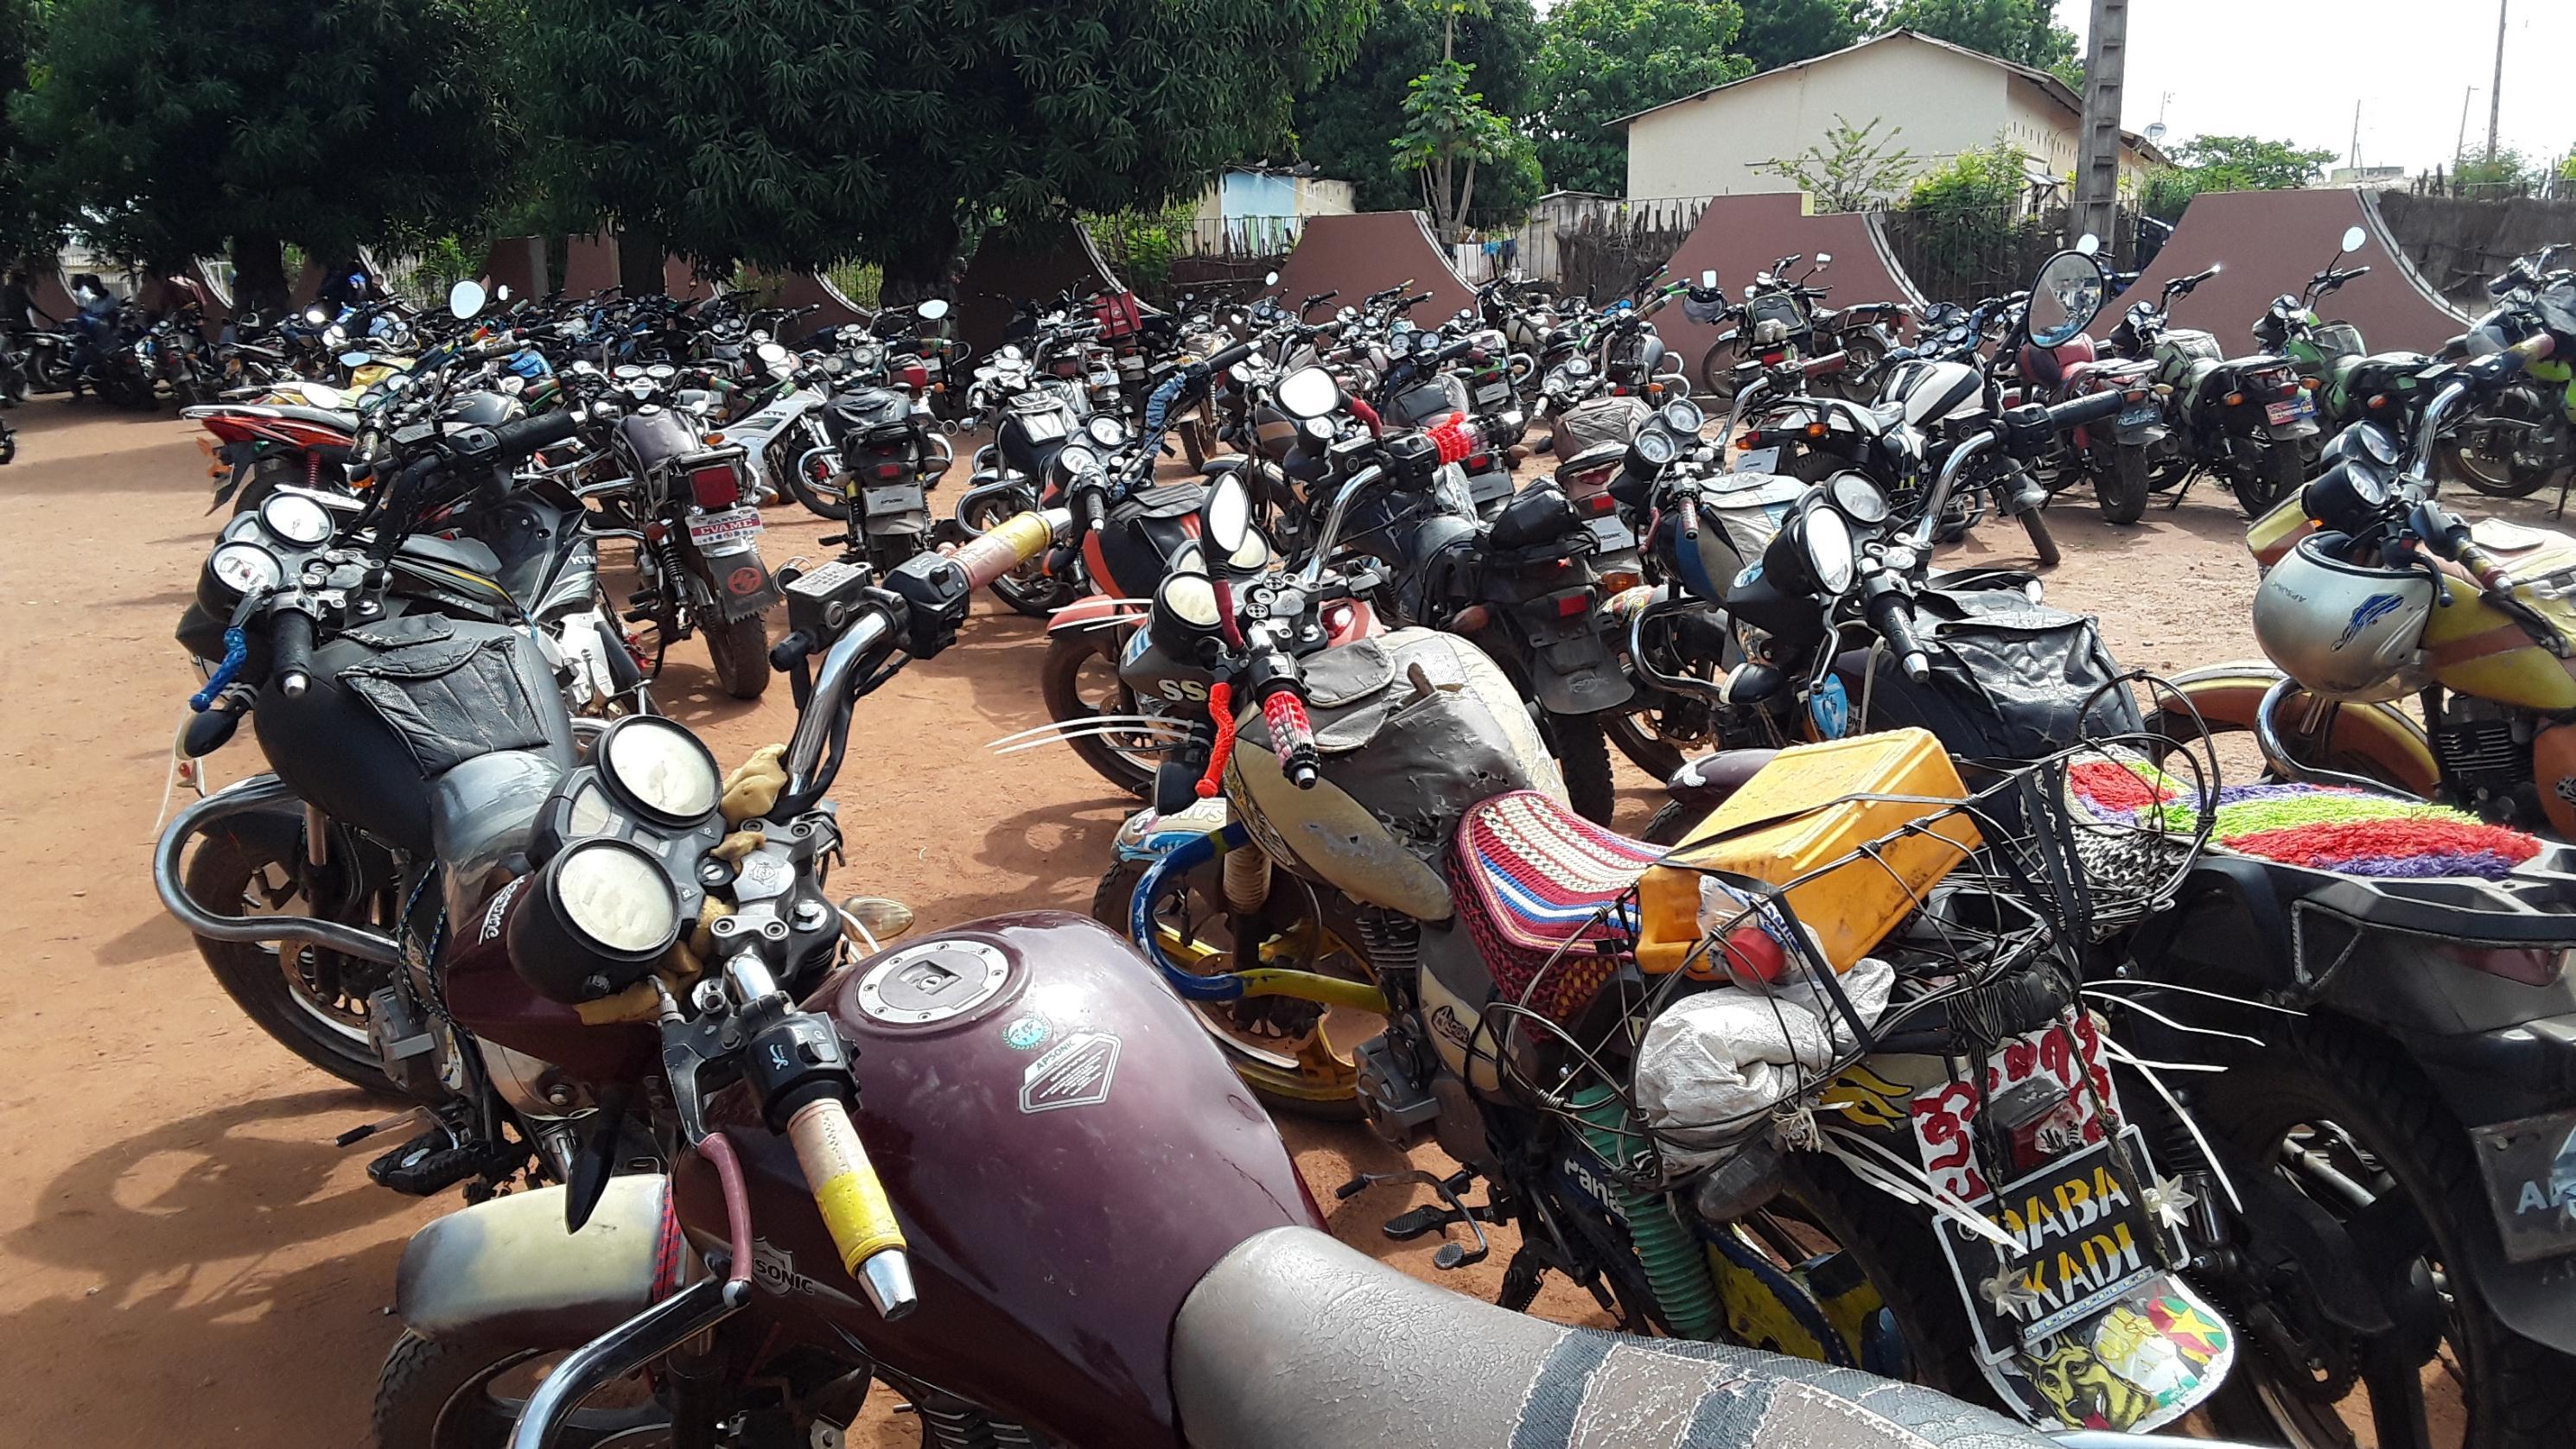 Vol de moto,Bouna,Dah Benjamin